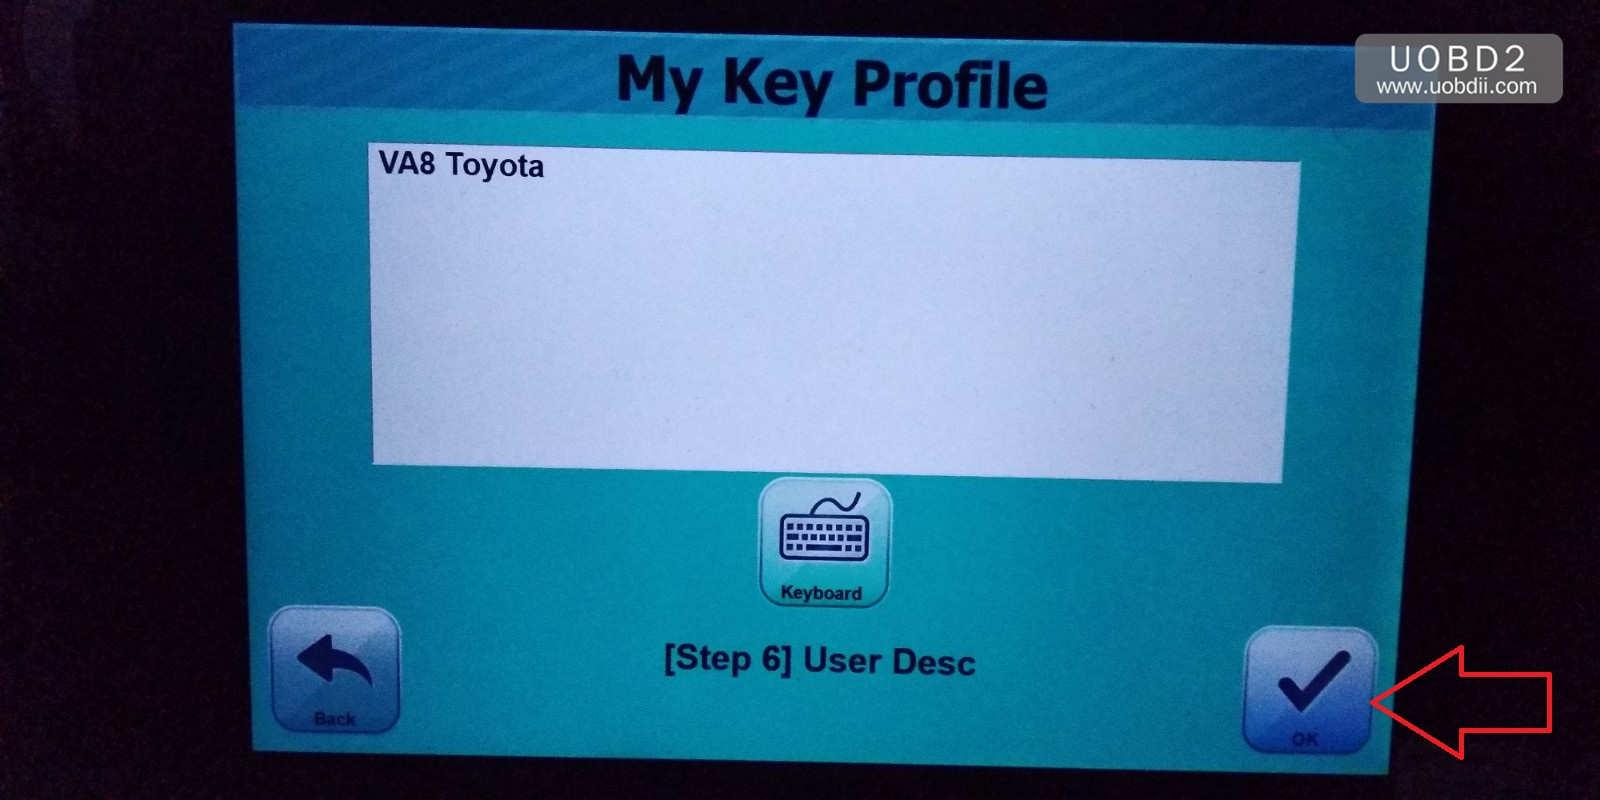 sec-e9z-create-new-key-for-va8-toyota-18